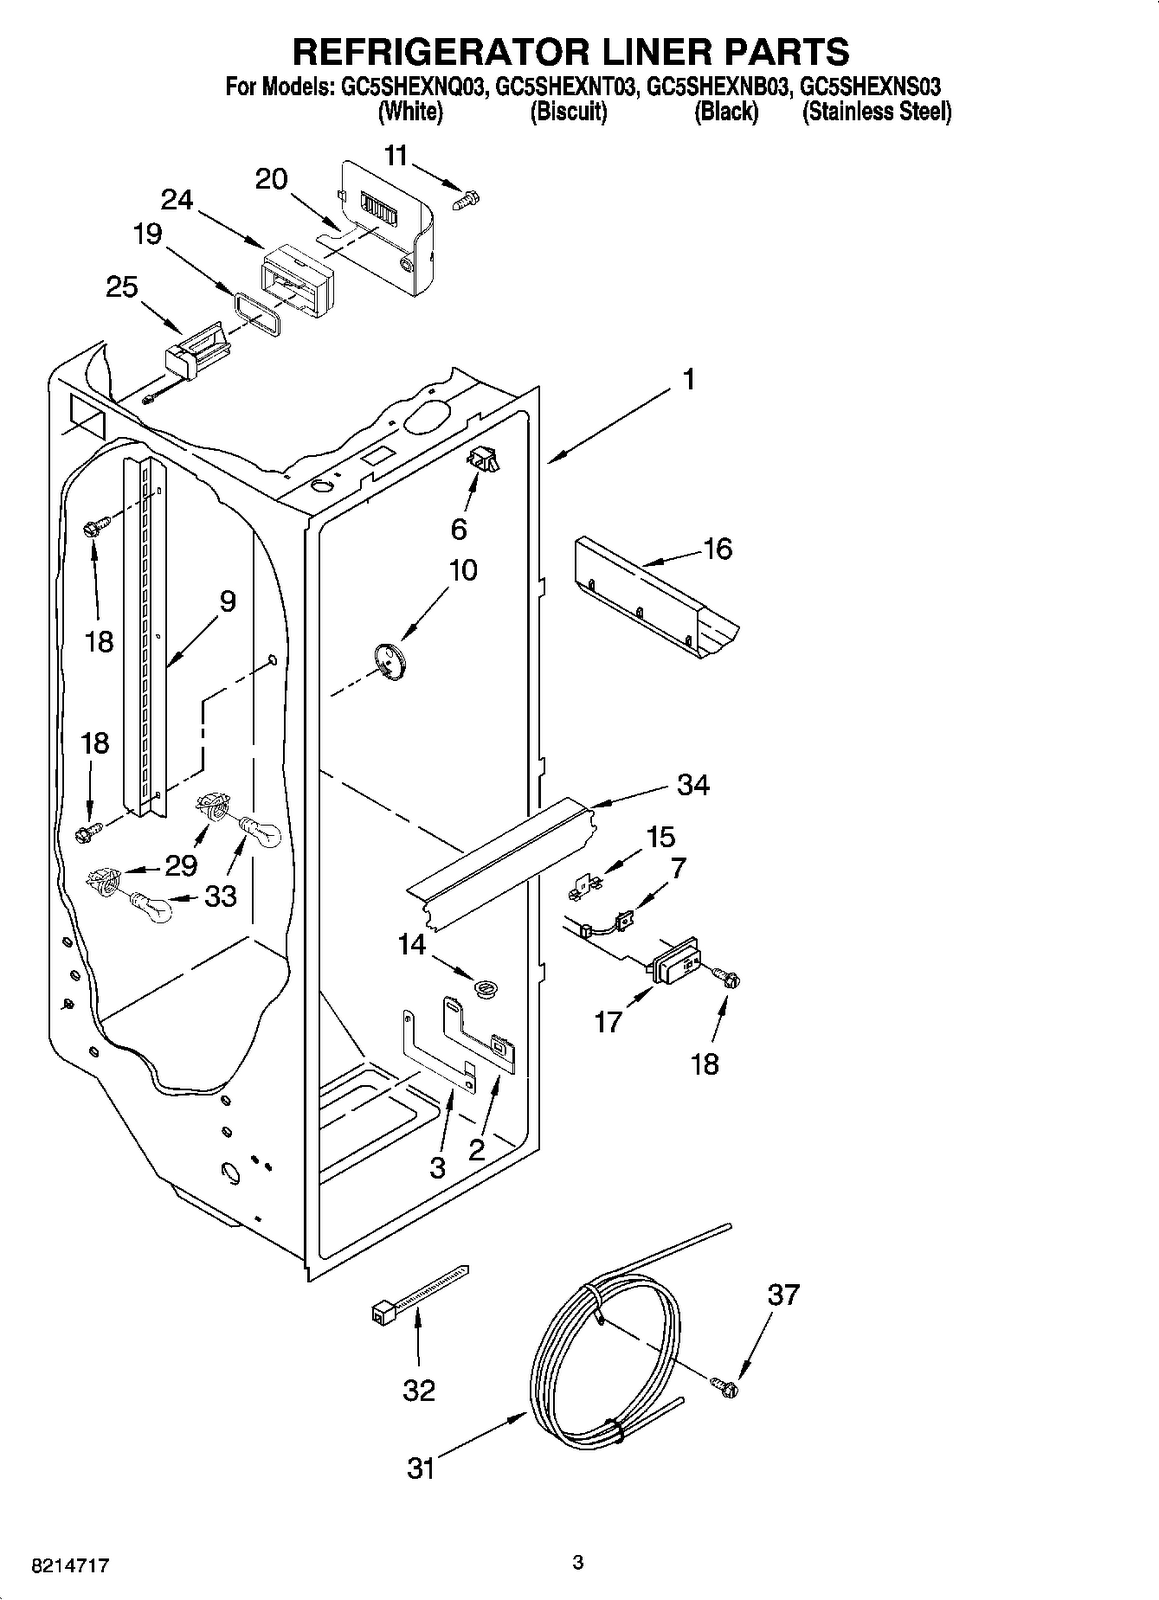 Led Electronics Usa Gc5shexns03 Refrigerator Compartment